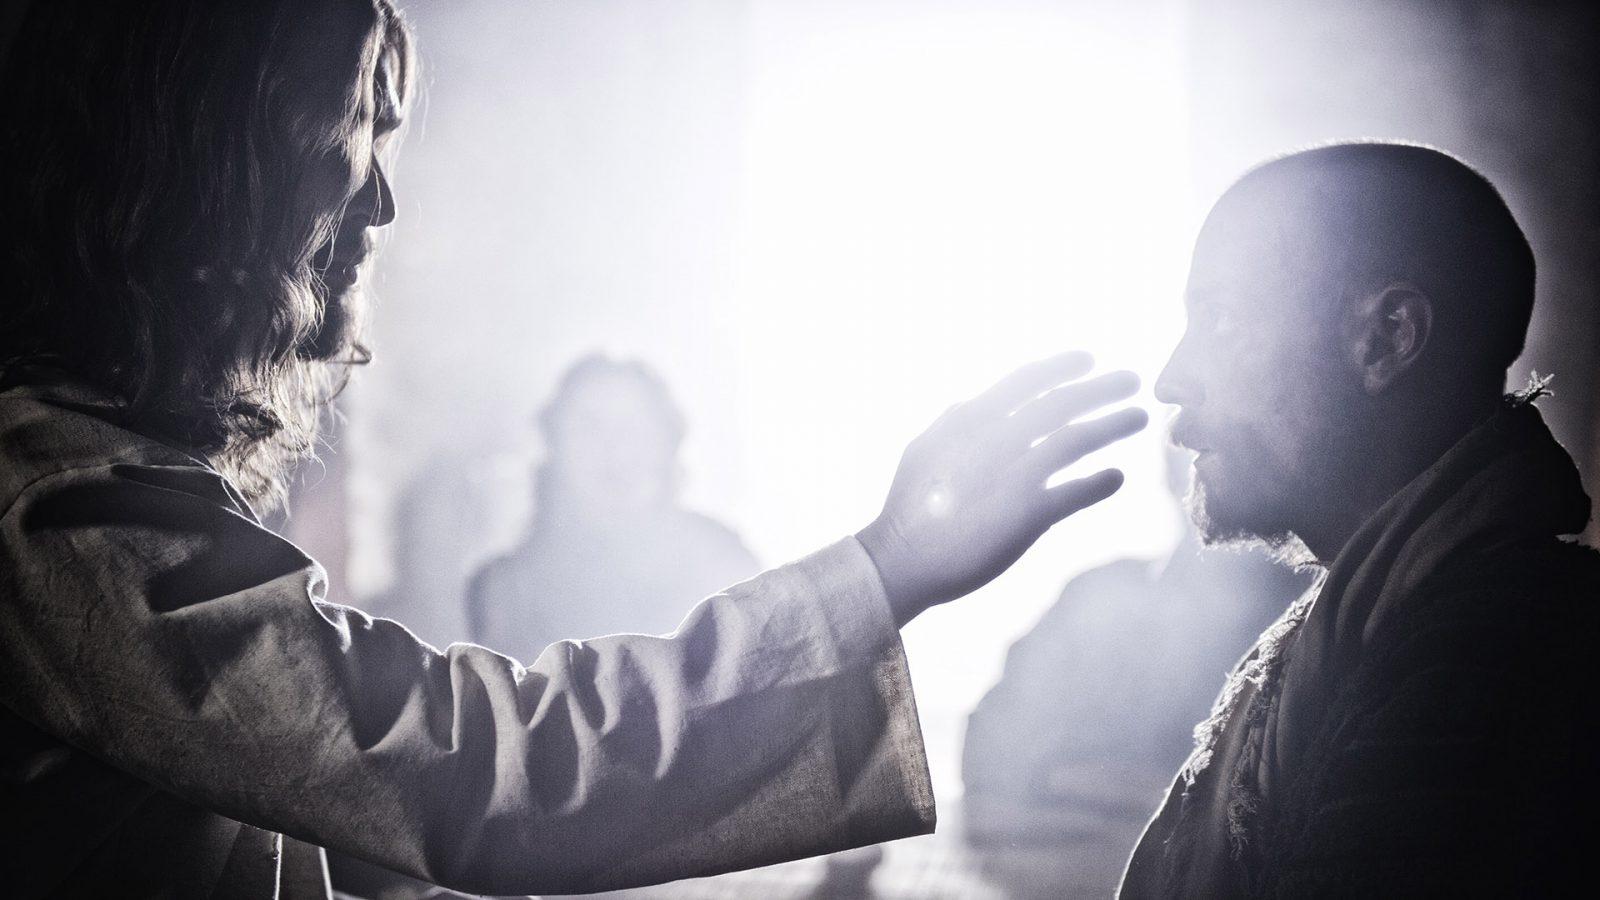 https://www.bisericabaptistasion.ro/wp-content/uploads/2021/05/revenirea-lui-toma-de-Cigher-Sorin-8-mai-2021.jpg